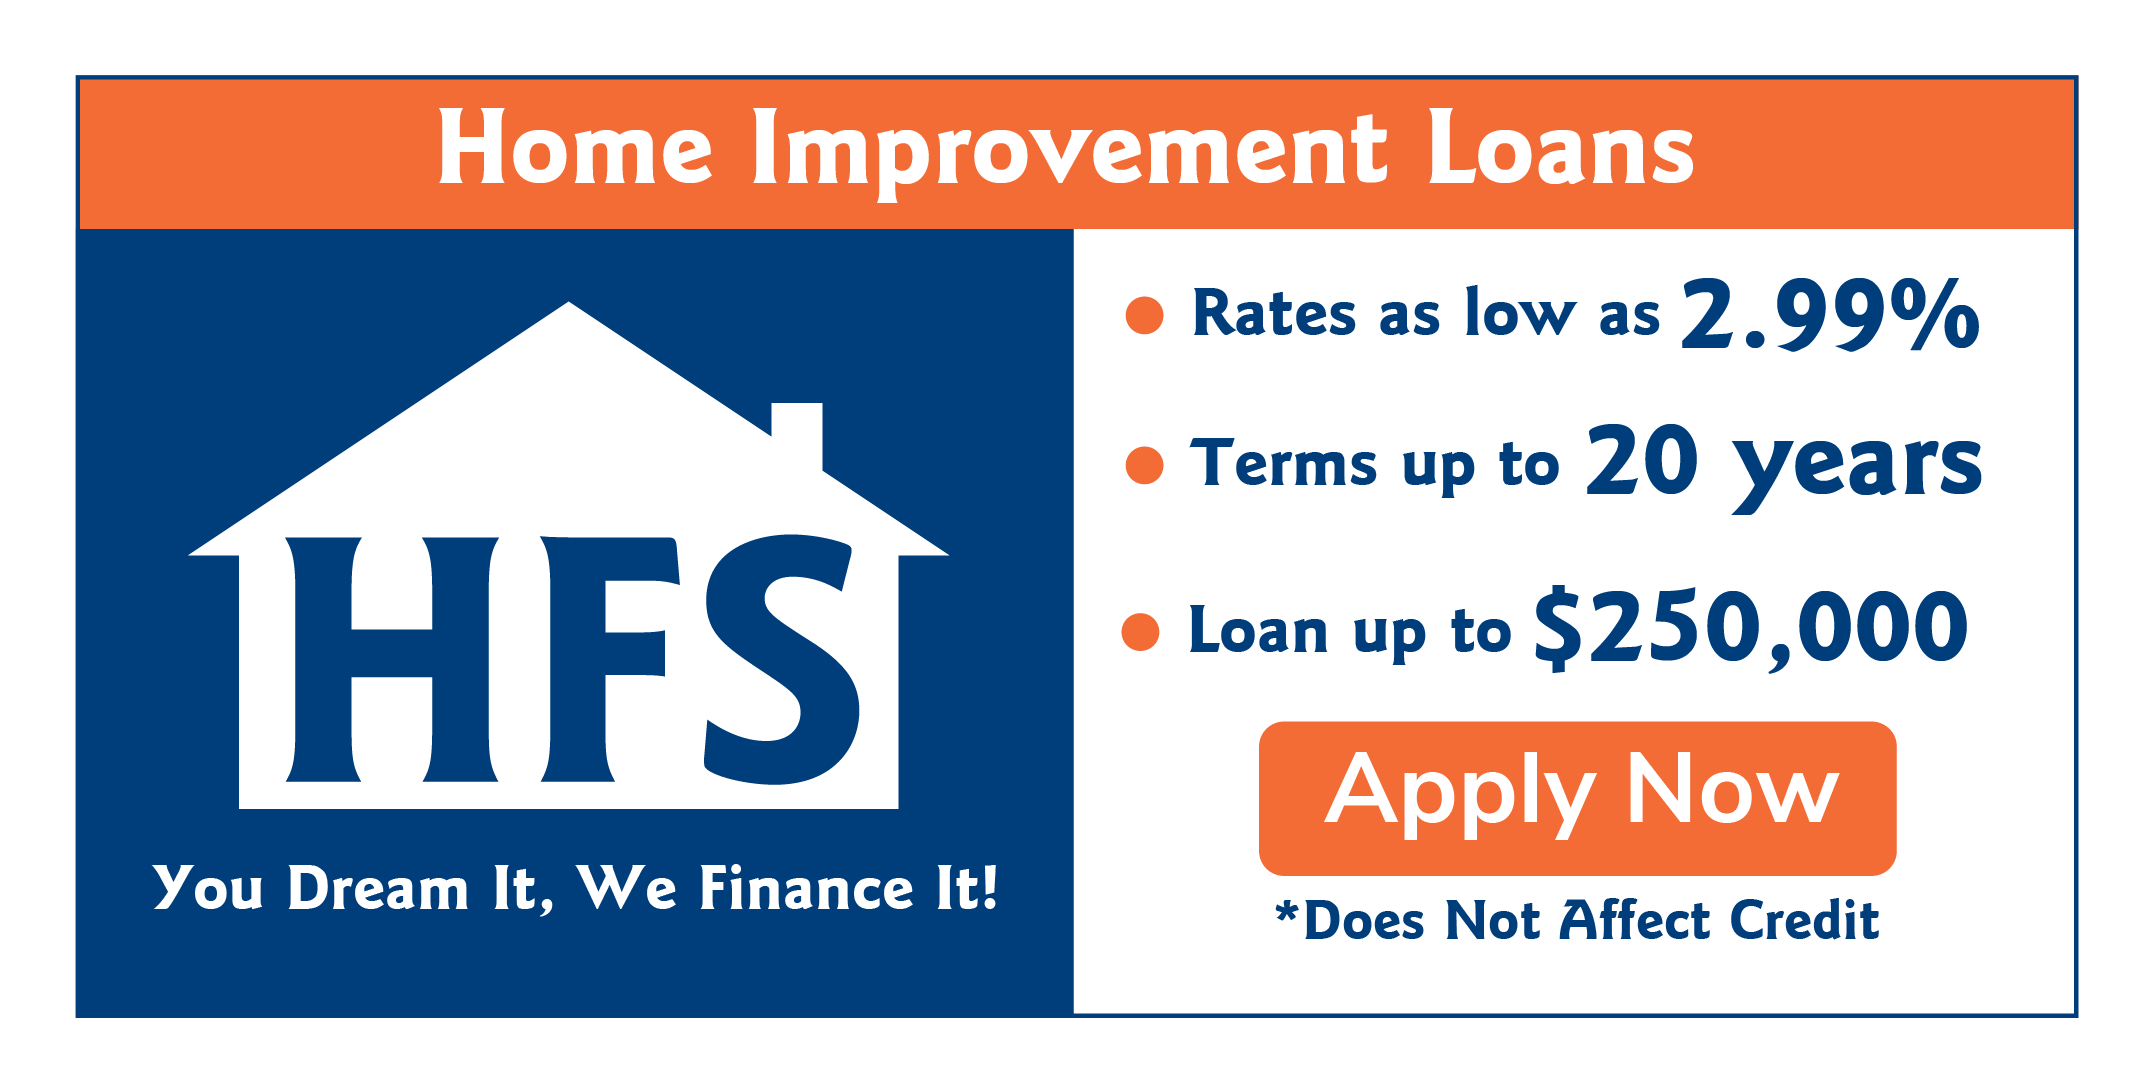 HFS Home Improvement Loan